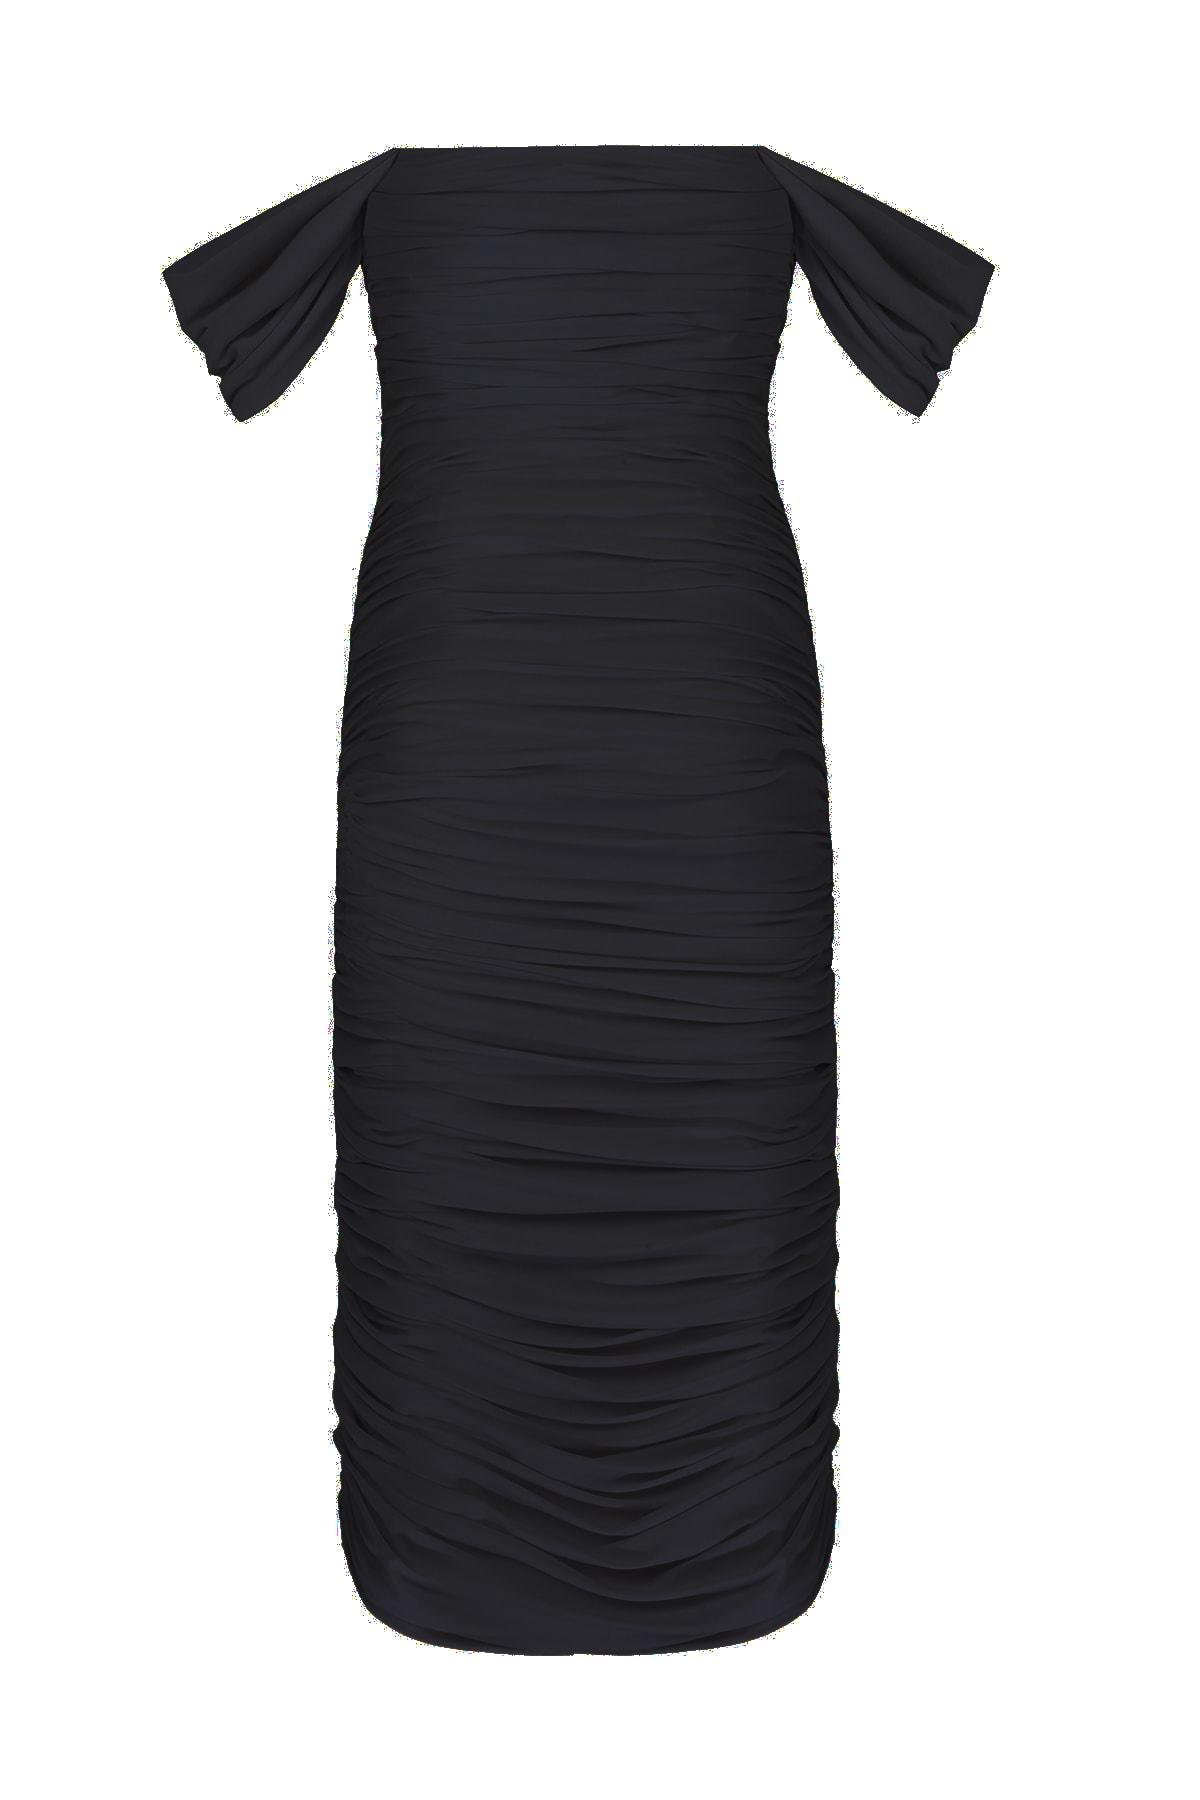 Whenever Company Siyah Düşük Kol Degajeli Drapeli Midi Elbise 2